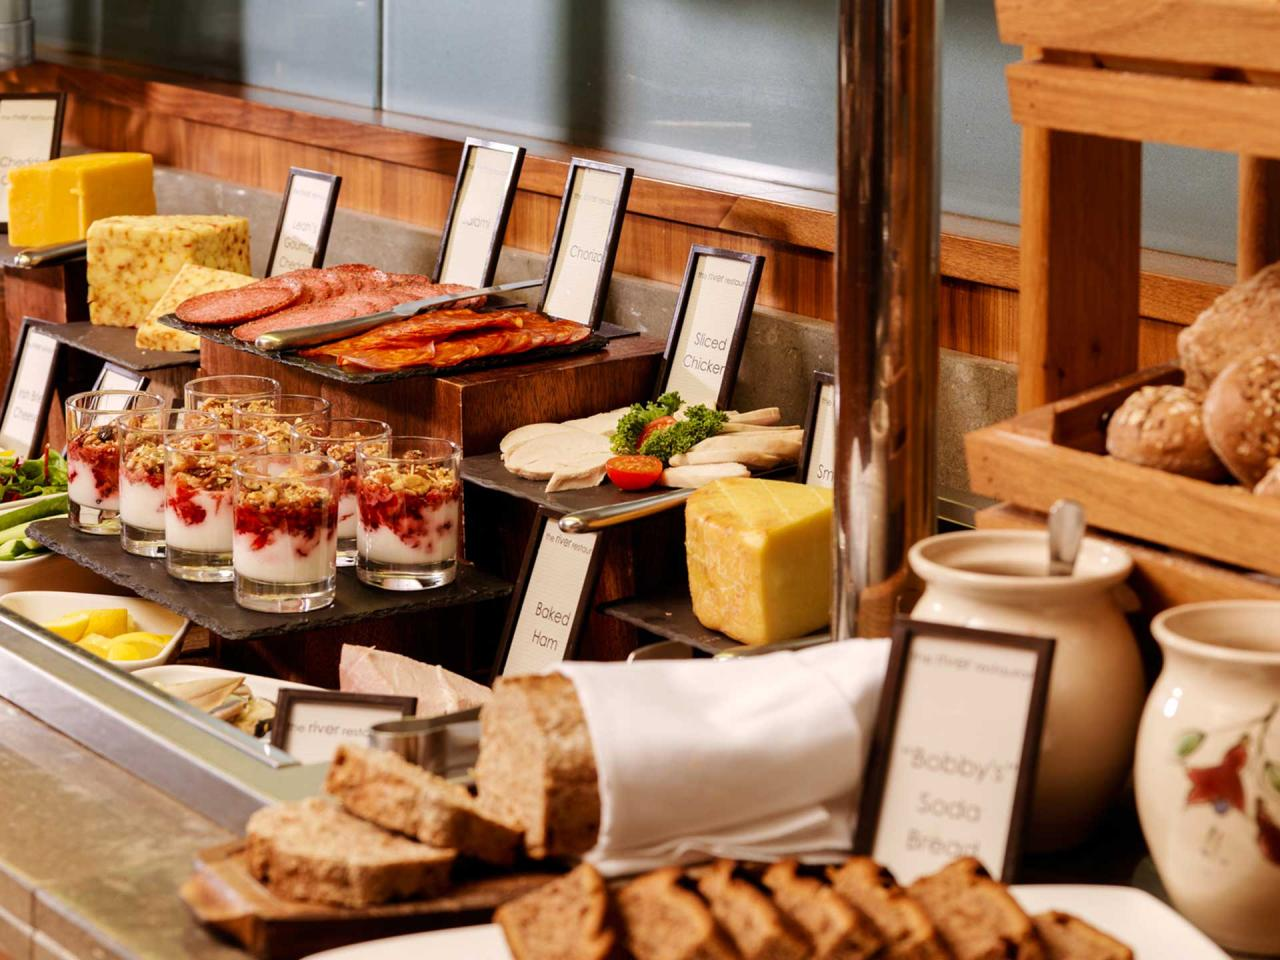 Strand Hotel Breakfast | Hotels Near Shannon | Limerick Strand